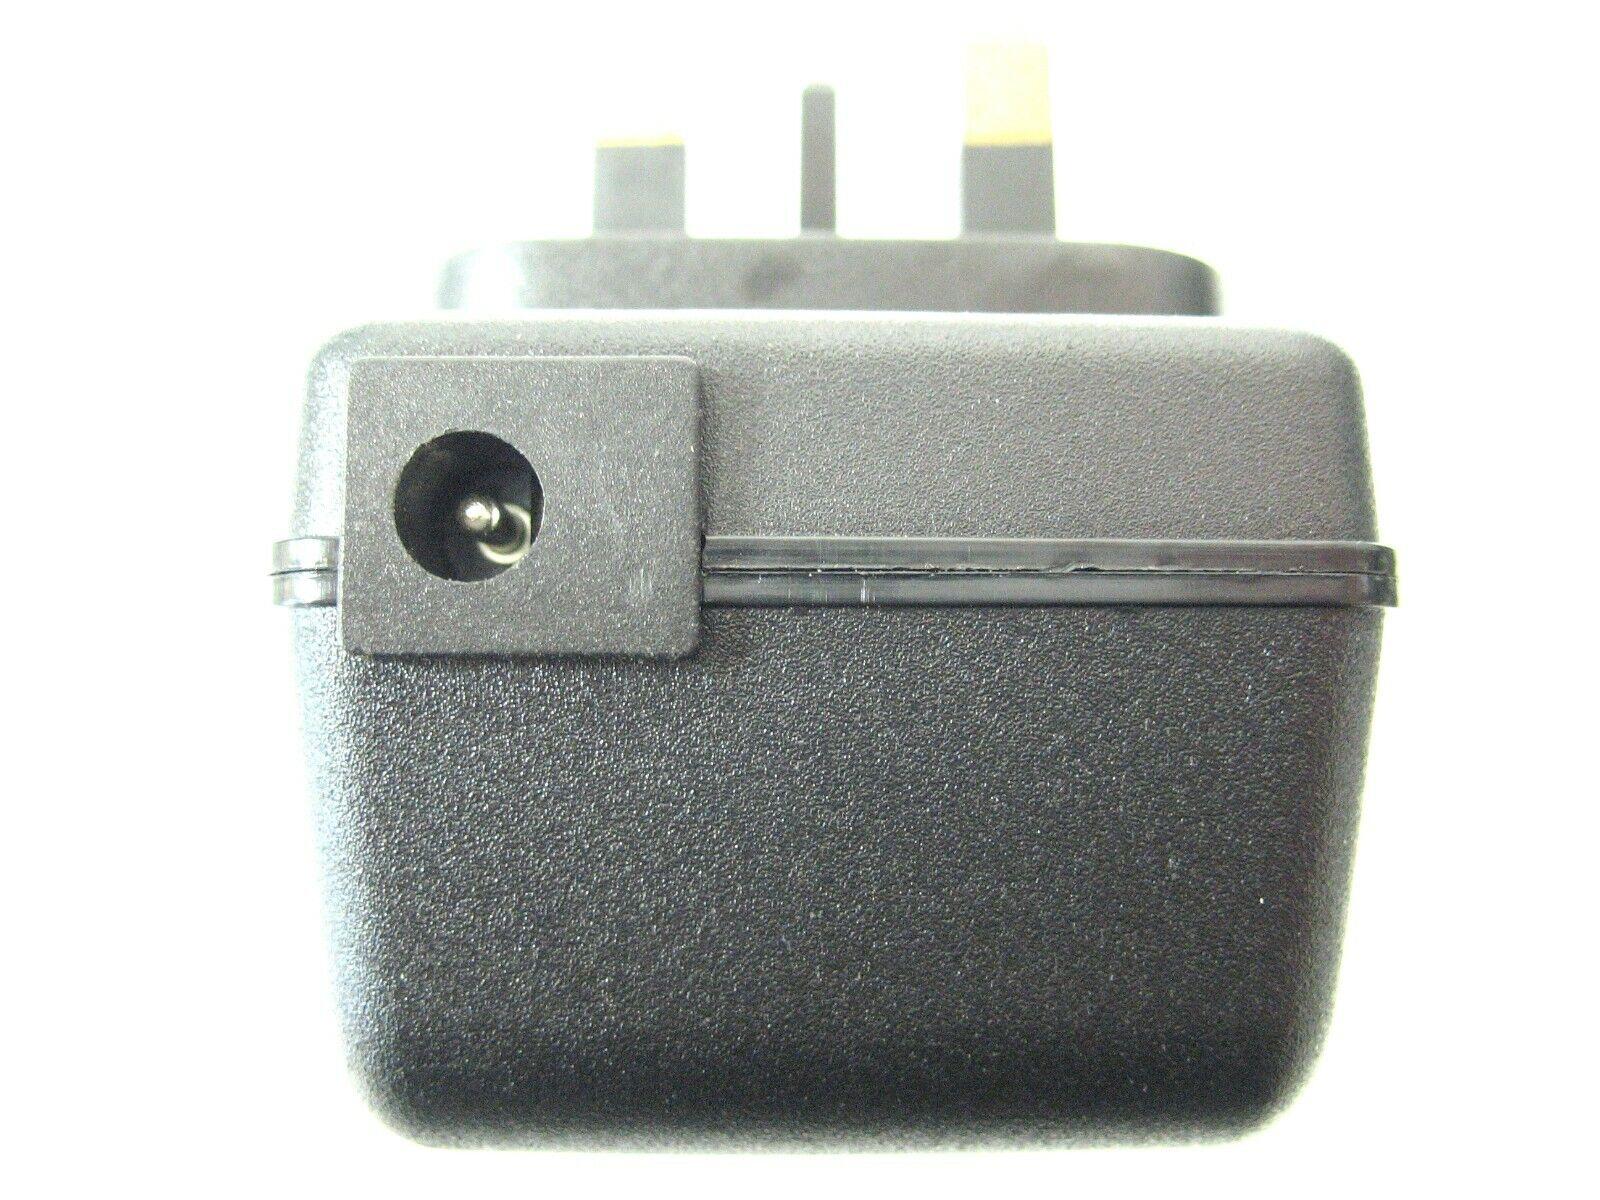 0.25 amp 24 volt Socket AC-AC (AC Output) Power Adaptor/Supply/Charger (6 watt)